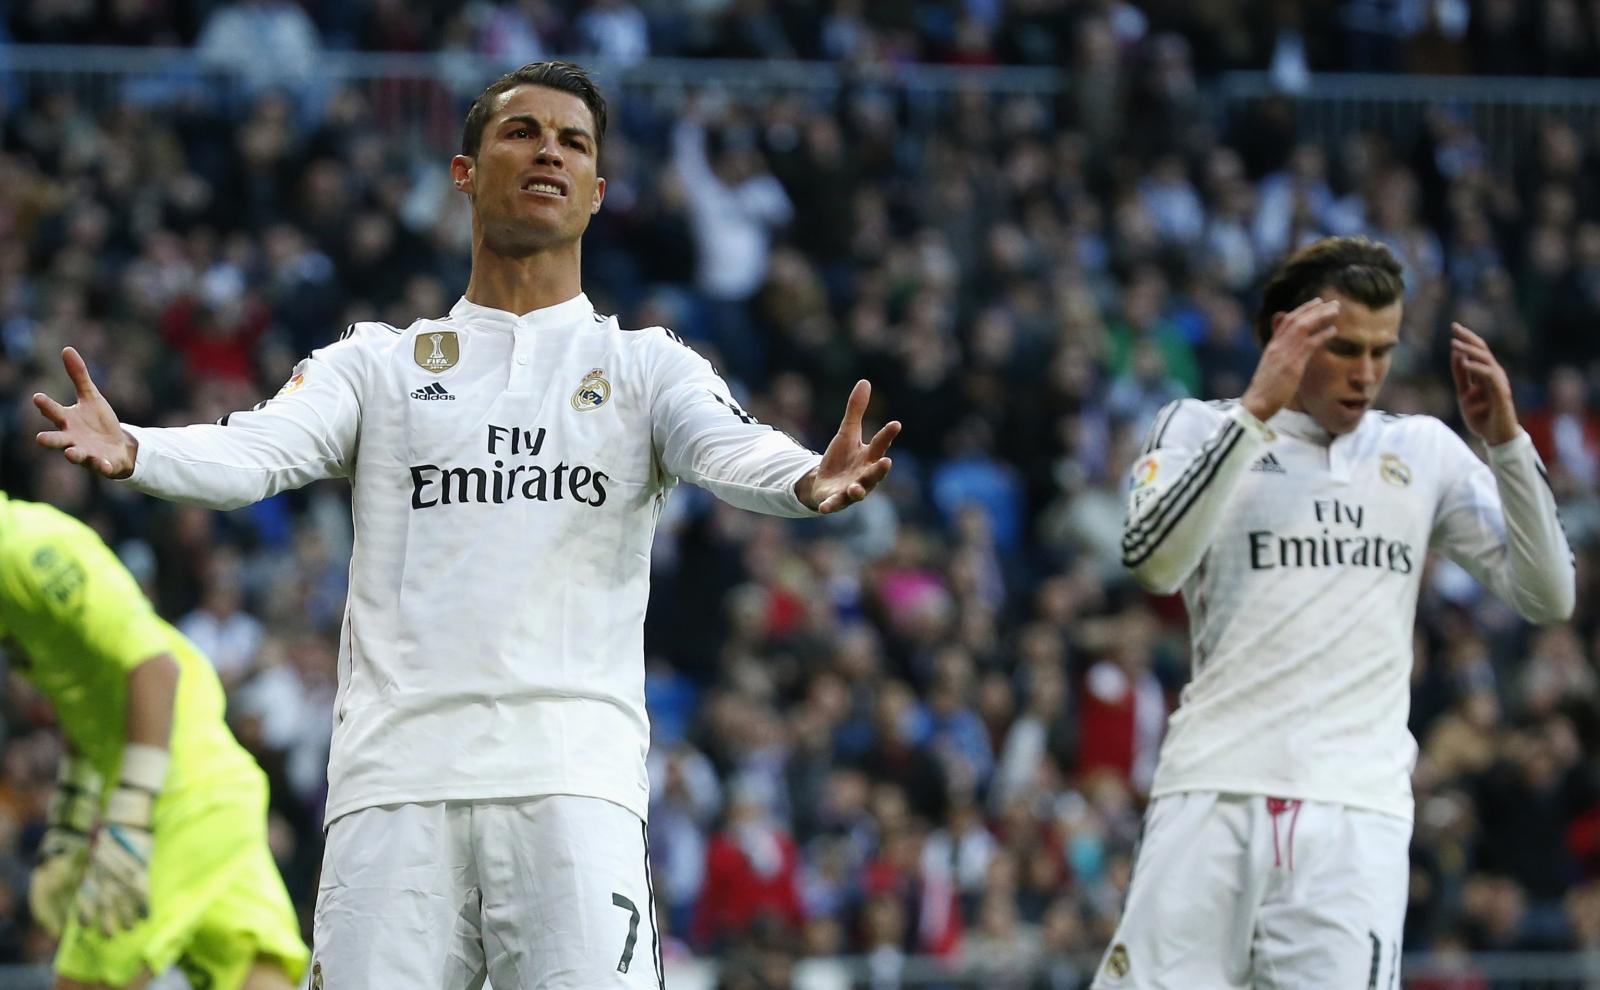 Ronaldo and Bale